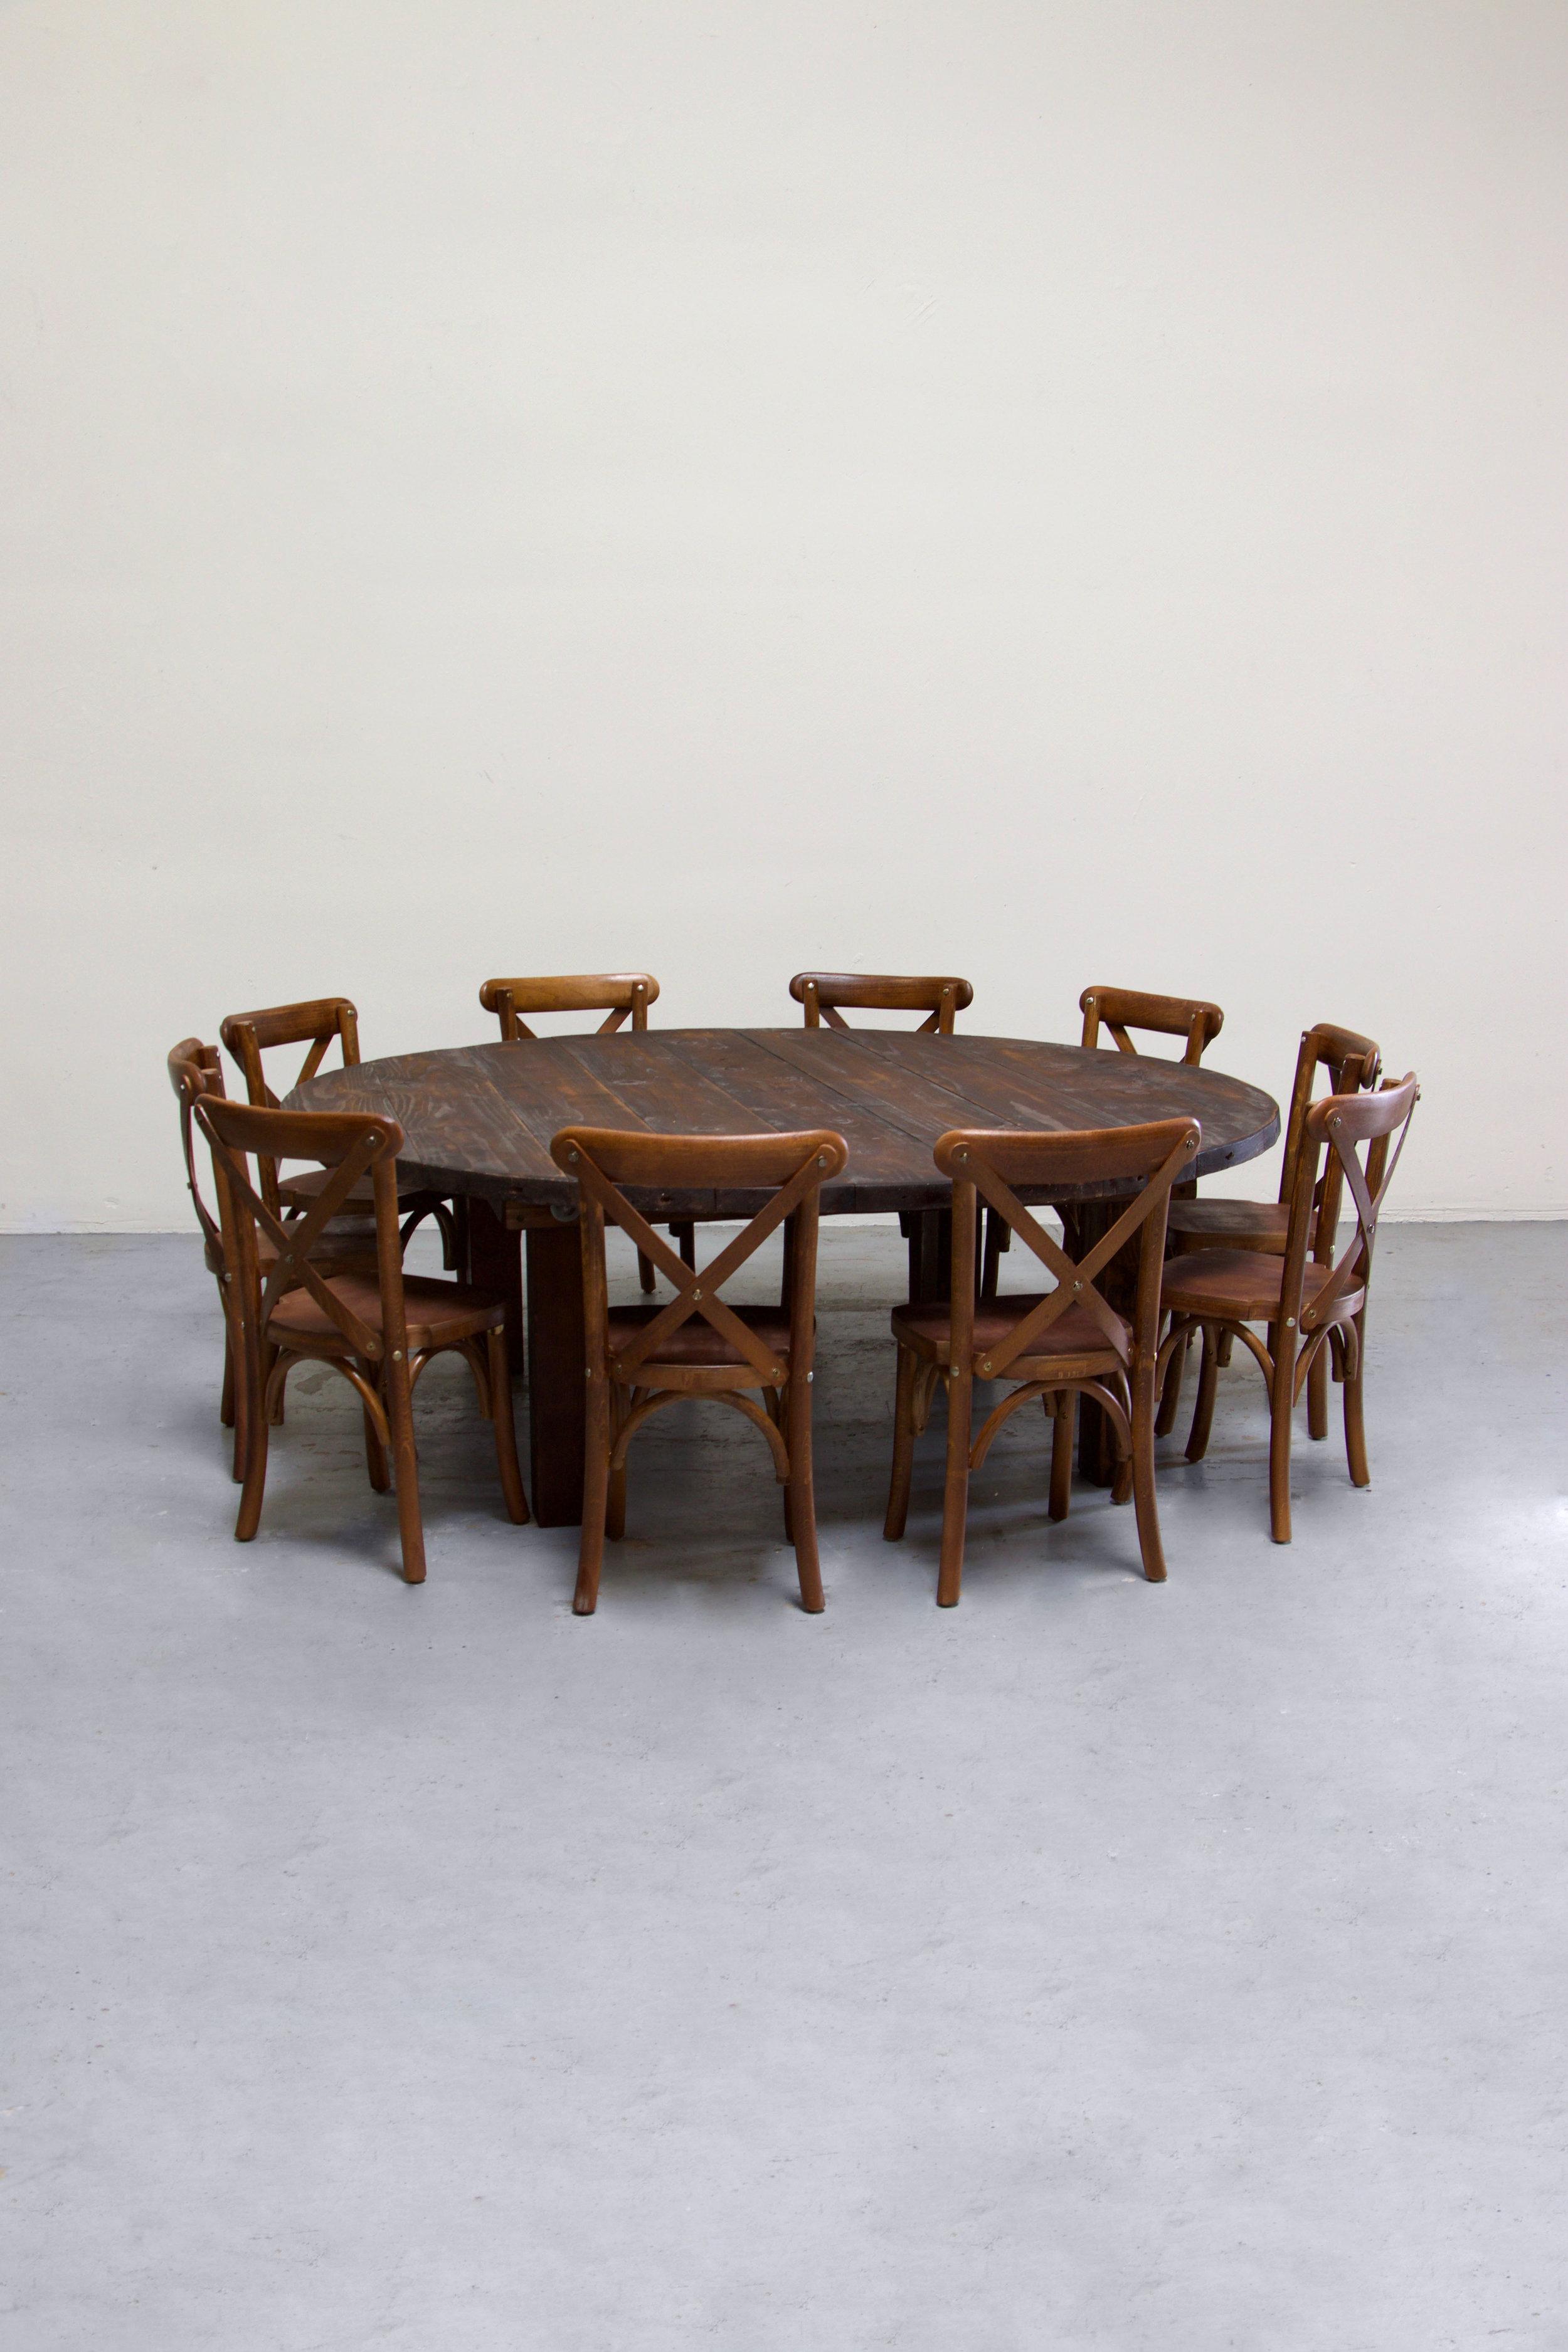 $135 1 Kids Mahogany Round Farm Table w/ 10 Cross-Back Chairs